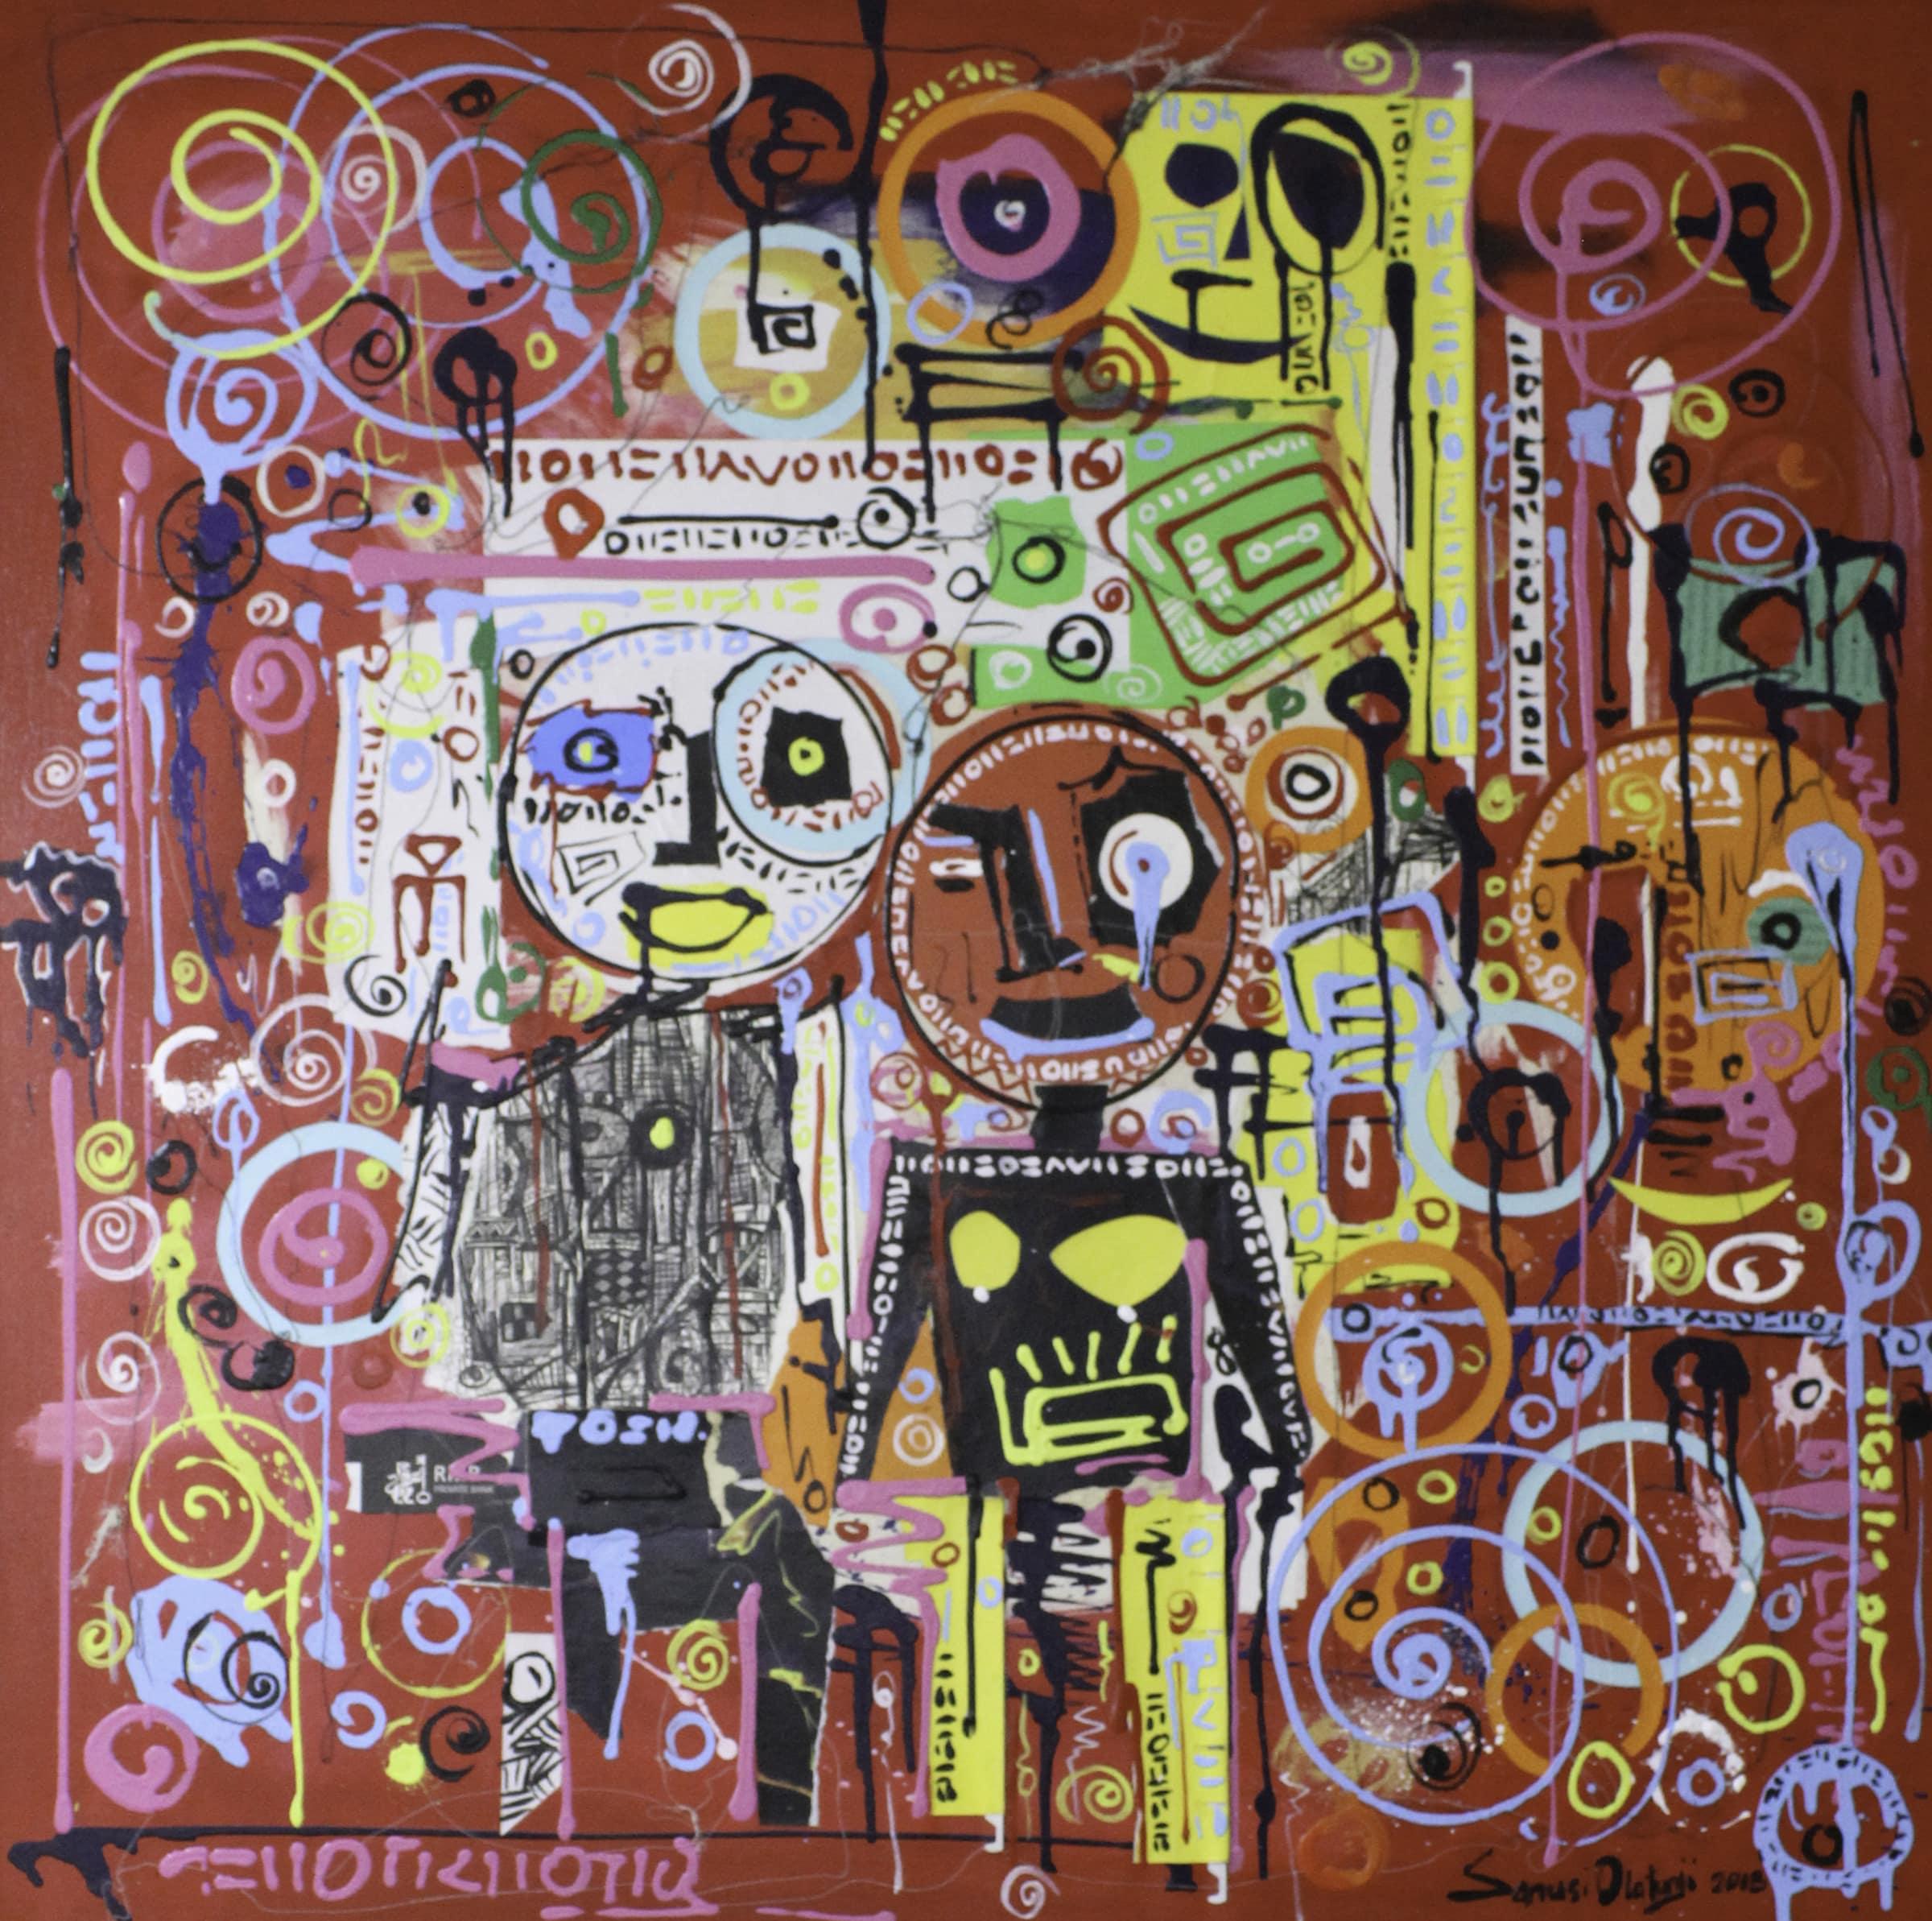 <span class=&#34;link fancybox-details-link&#34;><a href=&#34;/artists/36-olatunji-sanusi/works/1345-olatunji-sanusi-best-friends-2-2018/&#34;>View Detail Page</a></span><div class=&#34;artist&#34;><strong>Olatunji Sanusi</strong></div> <div class=&#34;title&#34;><em>Best Friends 2</em>, 2018</div> <div class=&#34;medium&#34;>Mixed Media </div> <div class=&#34;dimensions&#34;>91cm x 91cm</div><div class=&#34;price&#34;>R13,000.00</div>